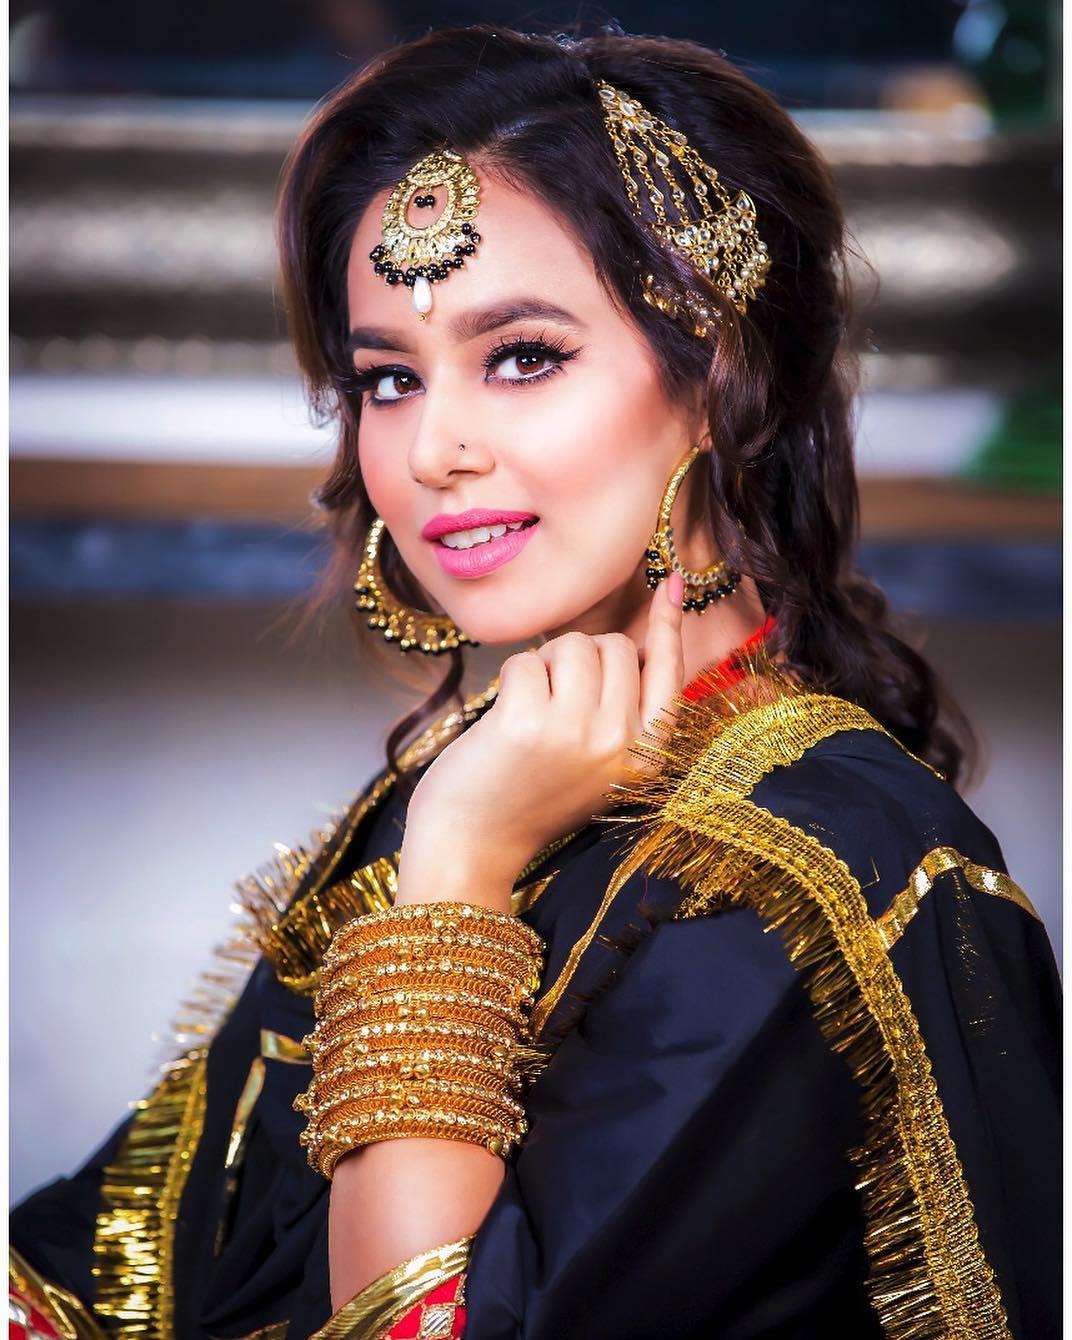 Sunanda Sharma pics for download